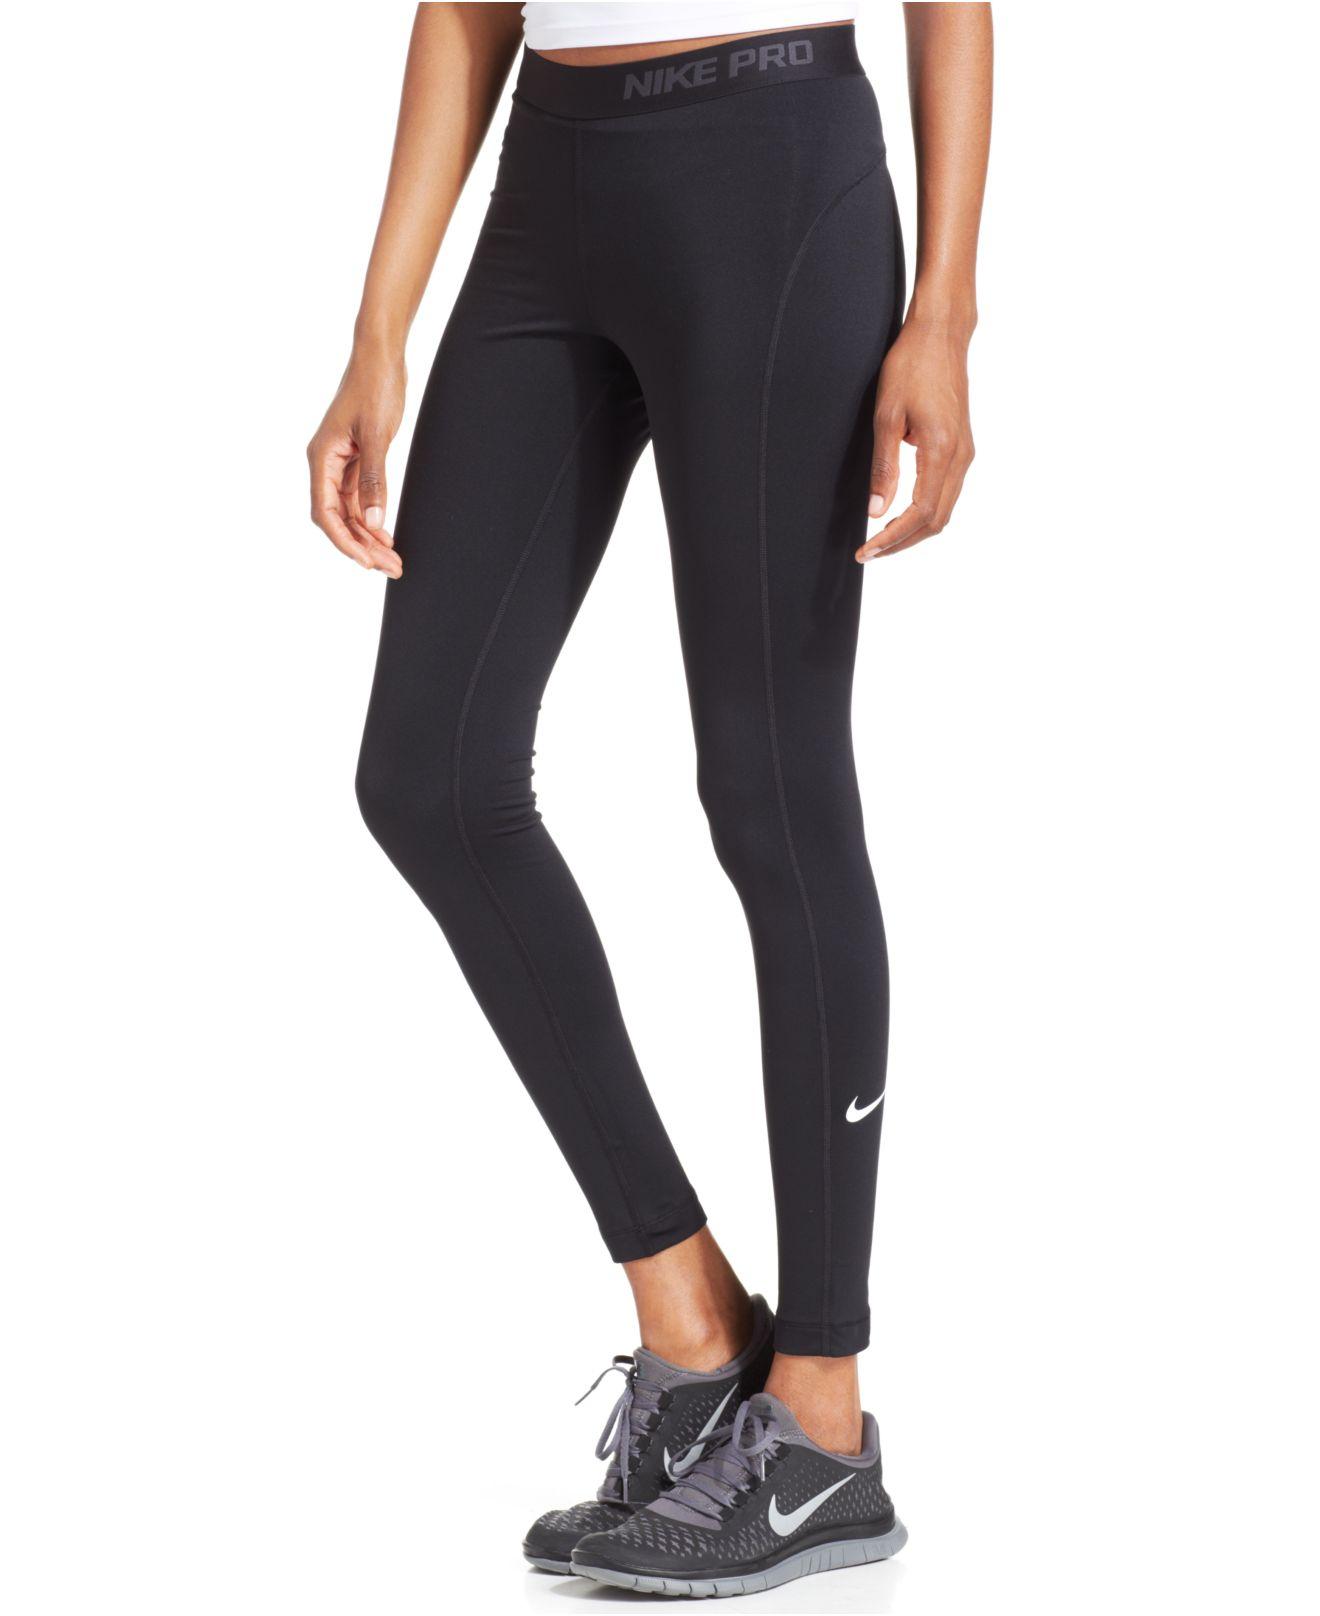 lyst nike pro hyperwarm 3 0 dri fit leggings in black. Black Bedroom Furniture Sets. Home Design Ideas